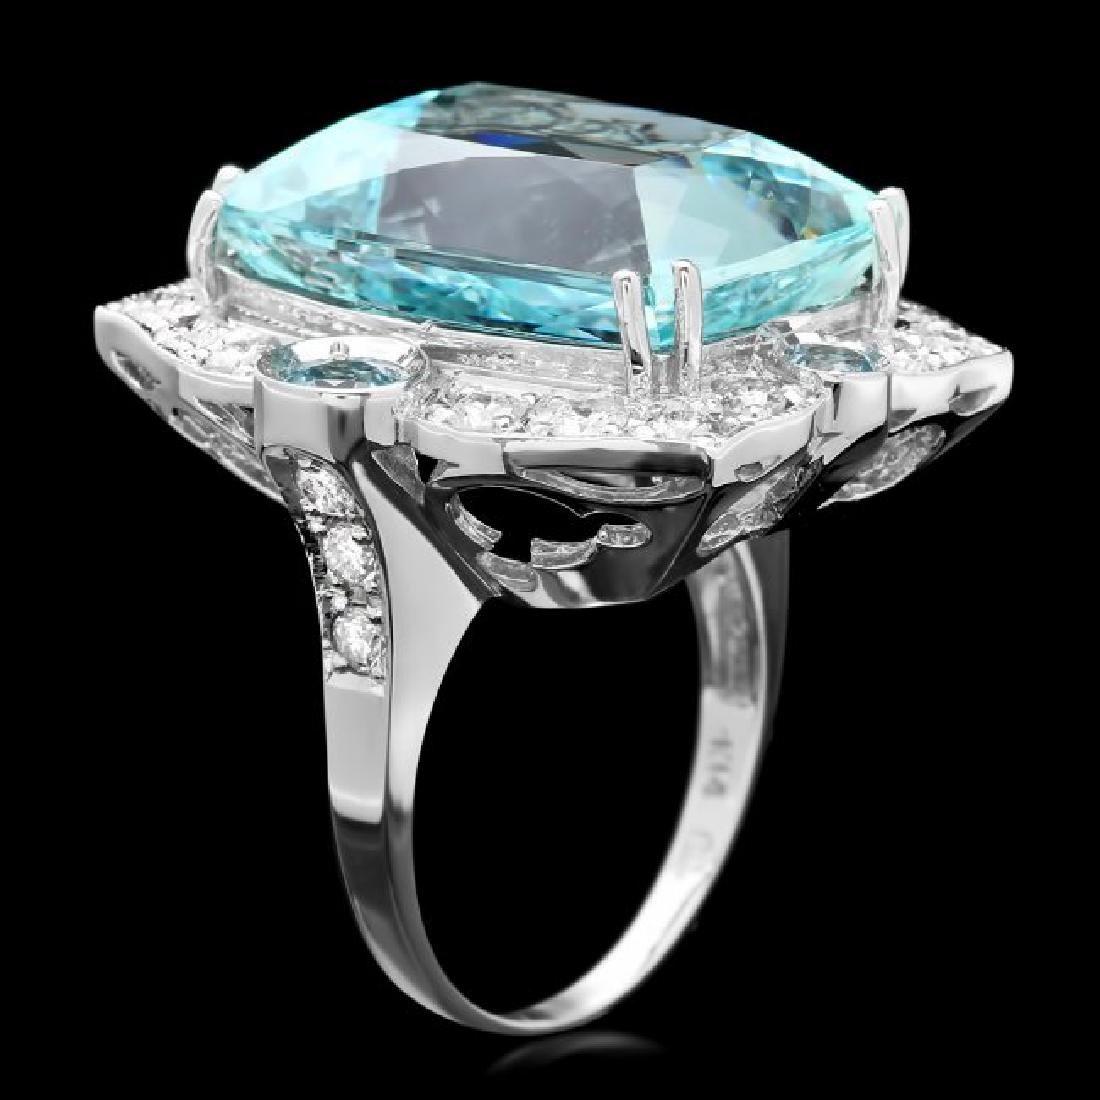 14k Gold 22ct Aquamarine 1.35ct Diamond Ring - 3